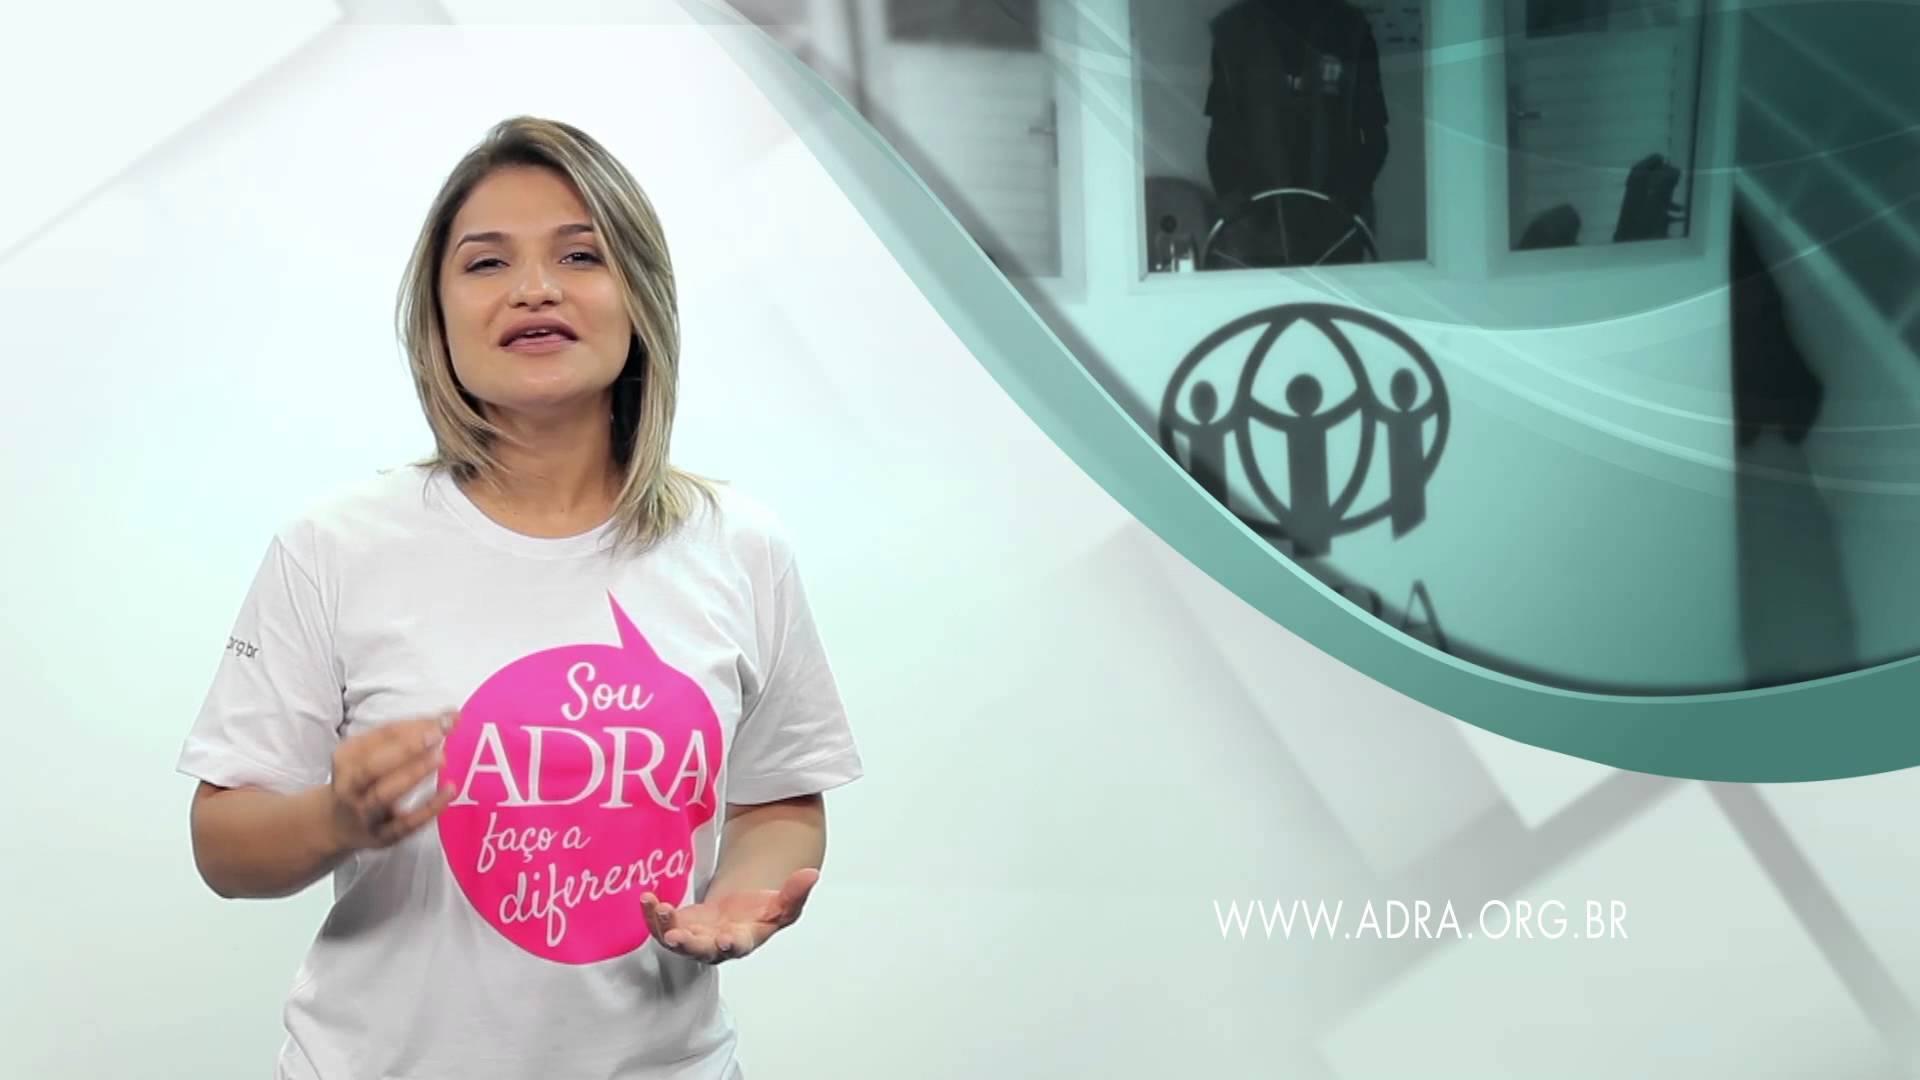 Luciana Santana – #souADRA